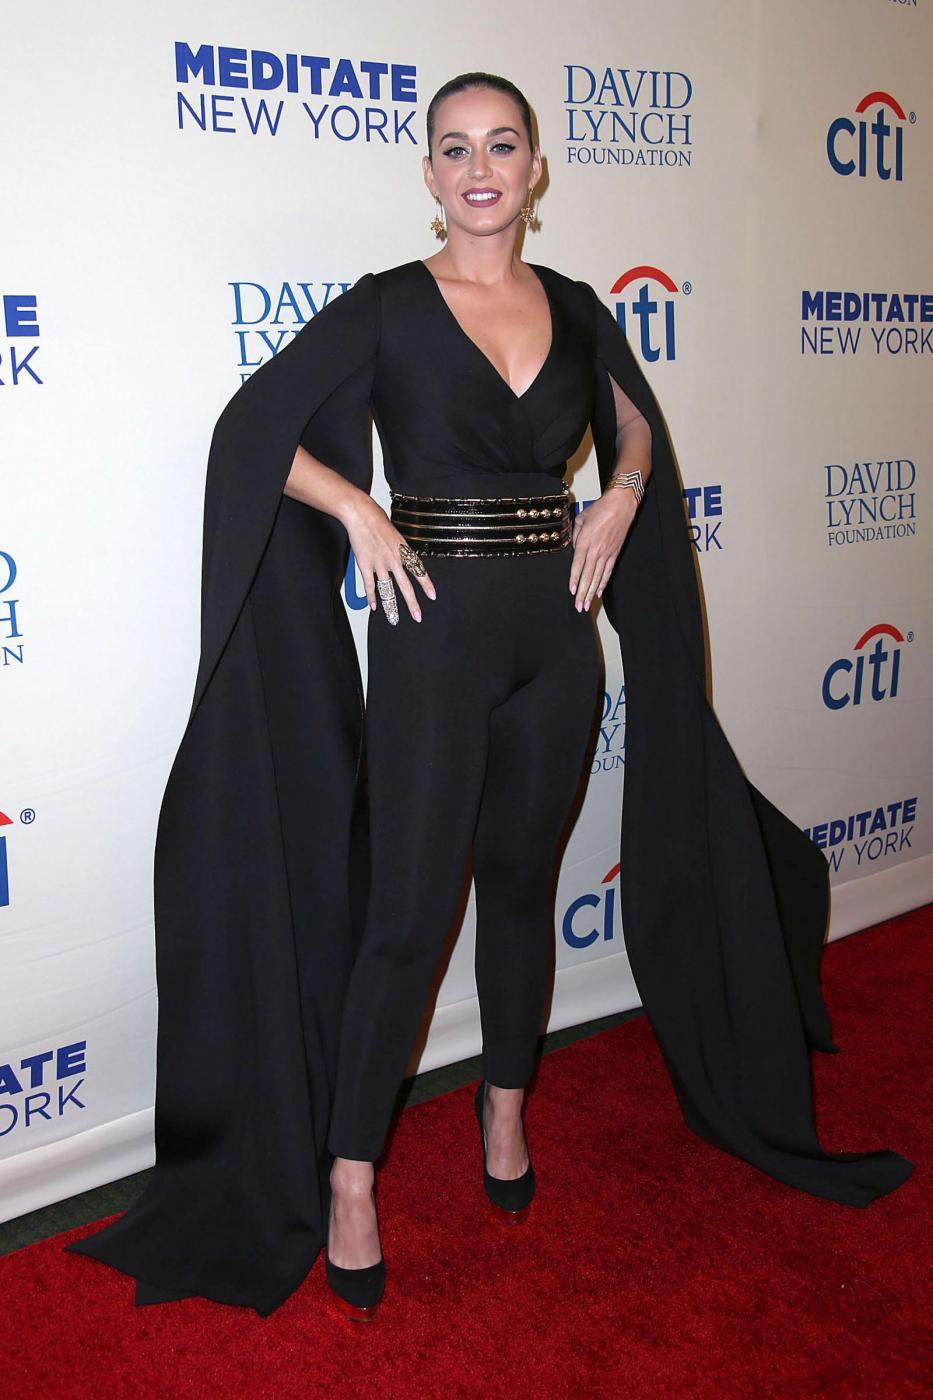 Katy Perry ingrassata? Sempre più curvy...FOTO 9